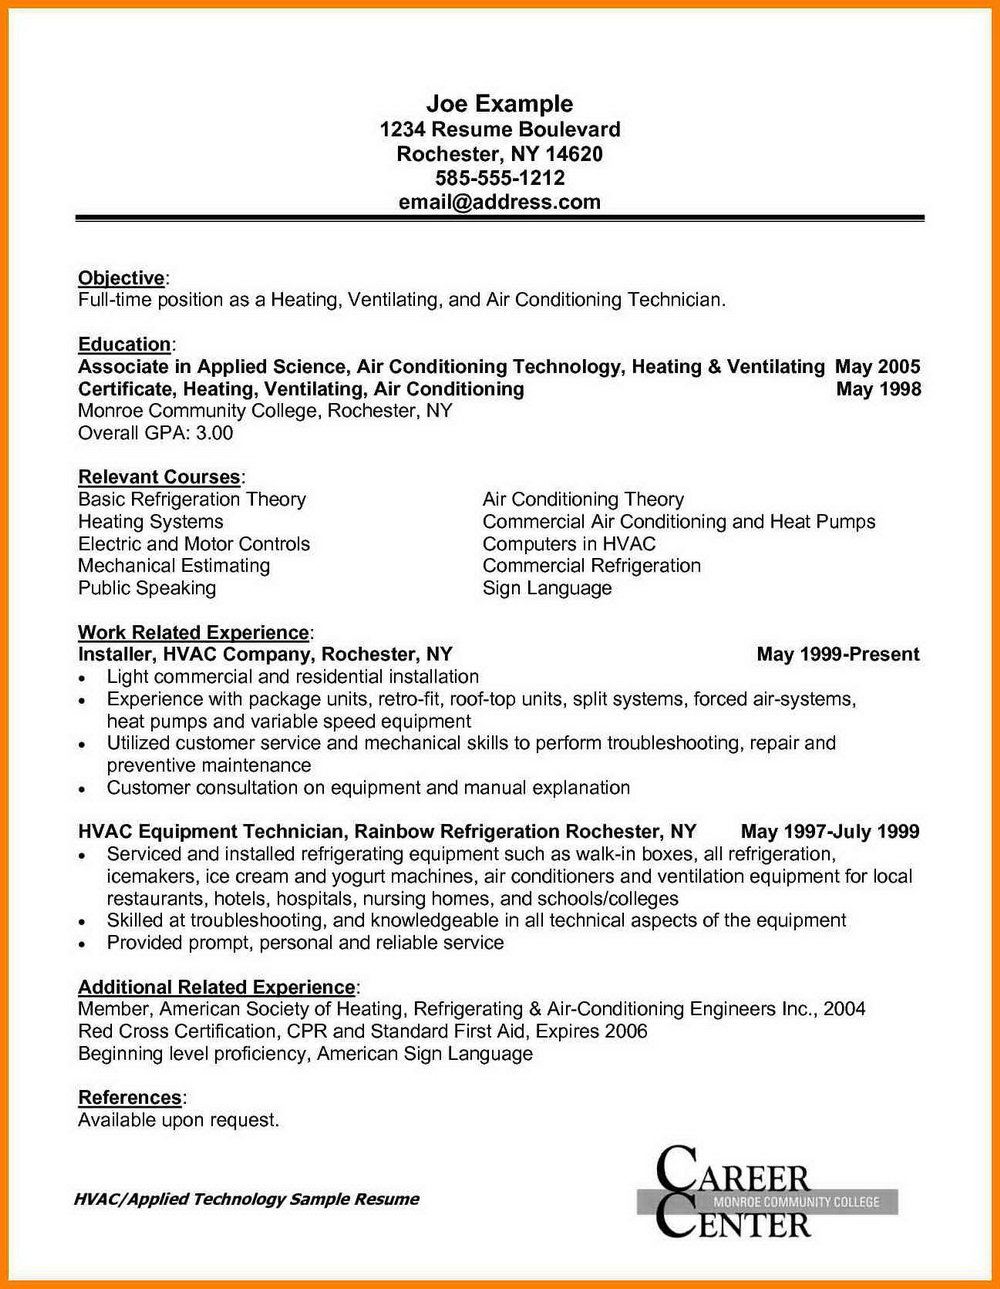 Example Cover Letter For Hvac Job